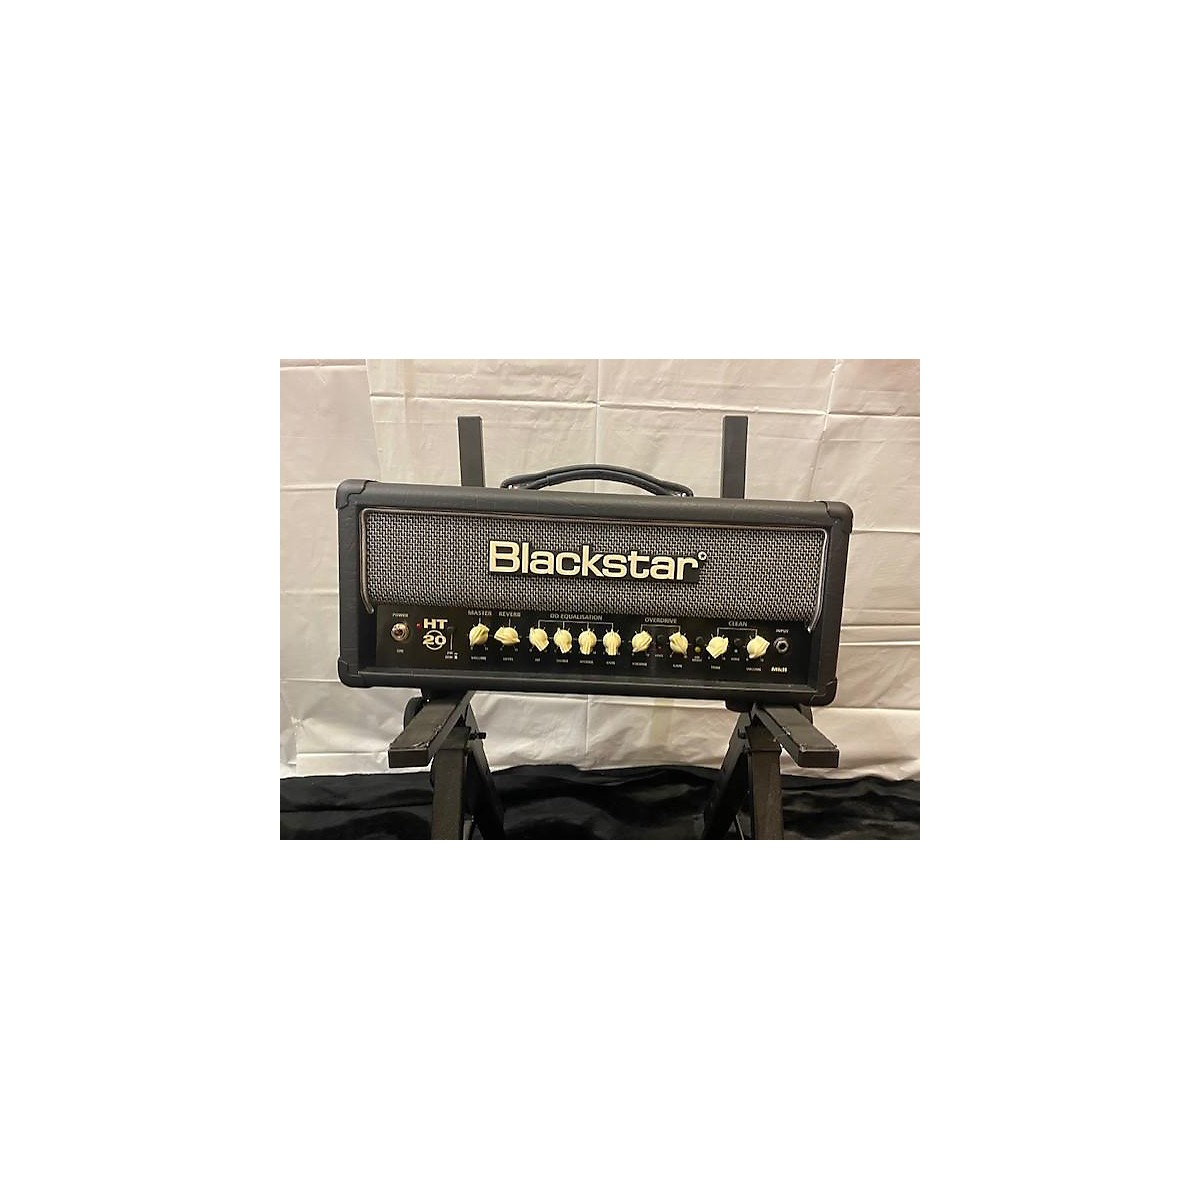 Blackstar HT20RH MkII 20W Tube Guitar Amp Head